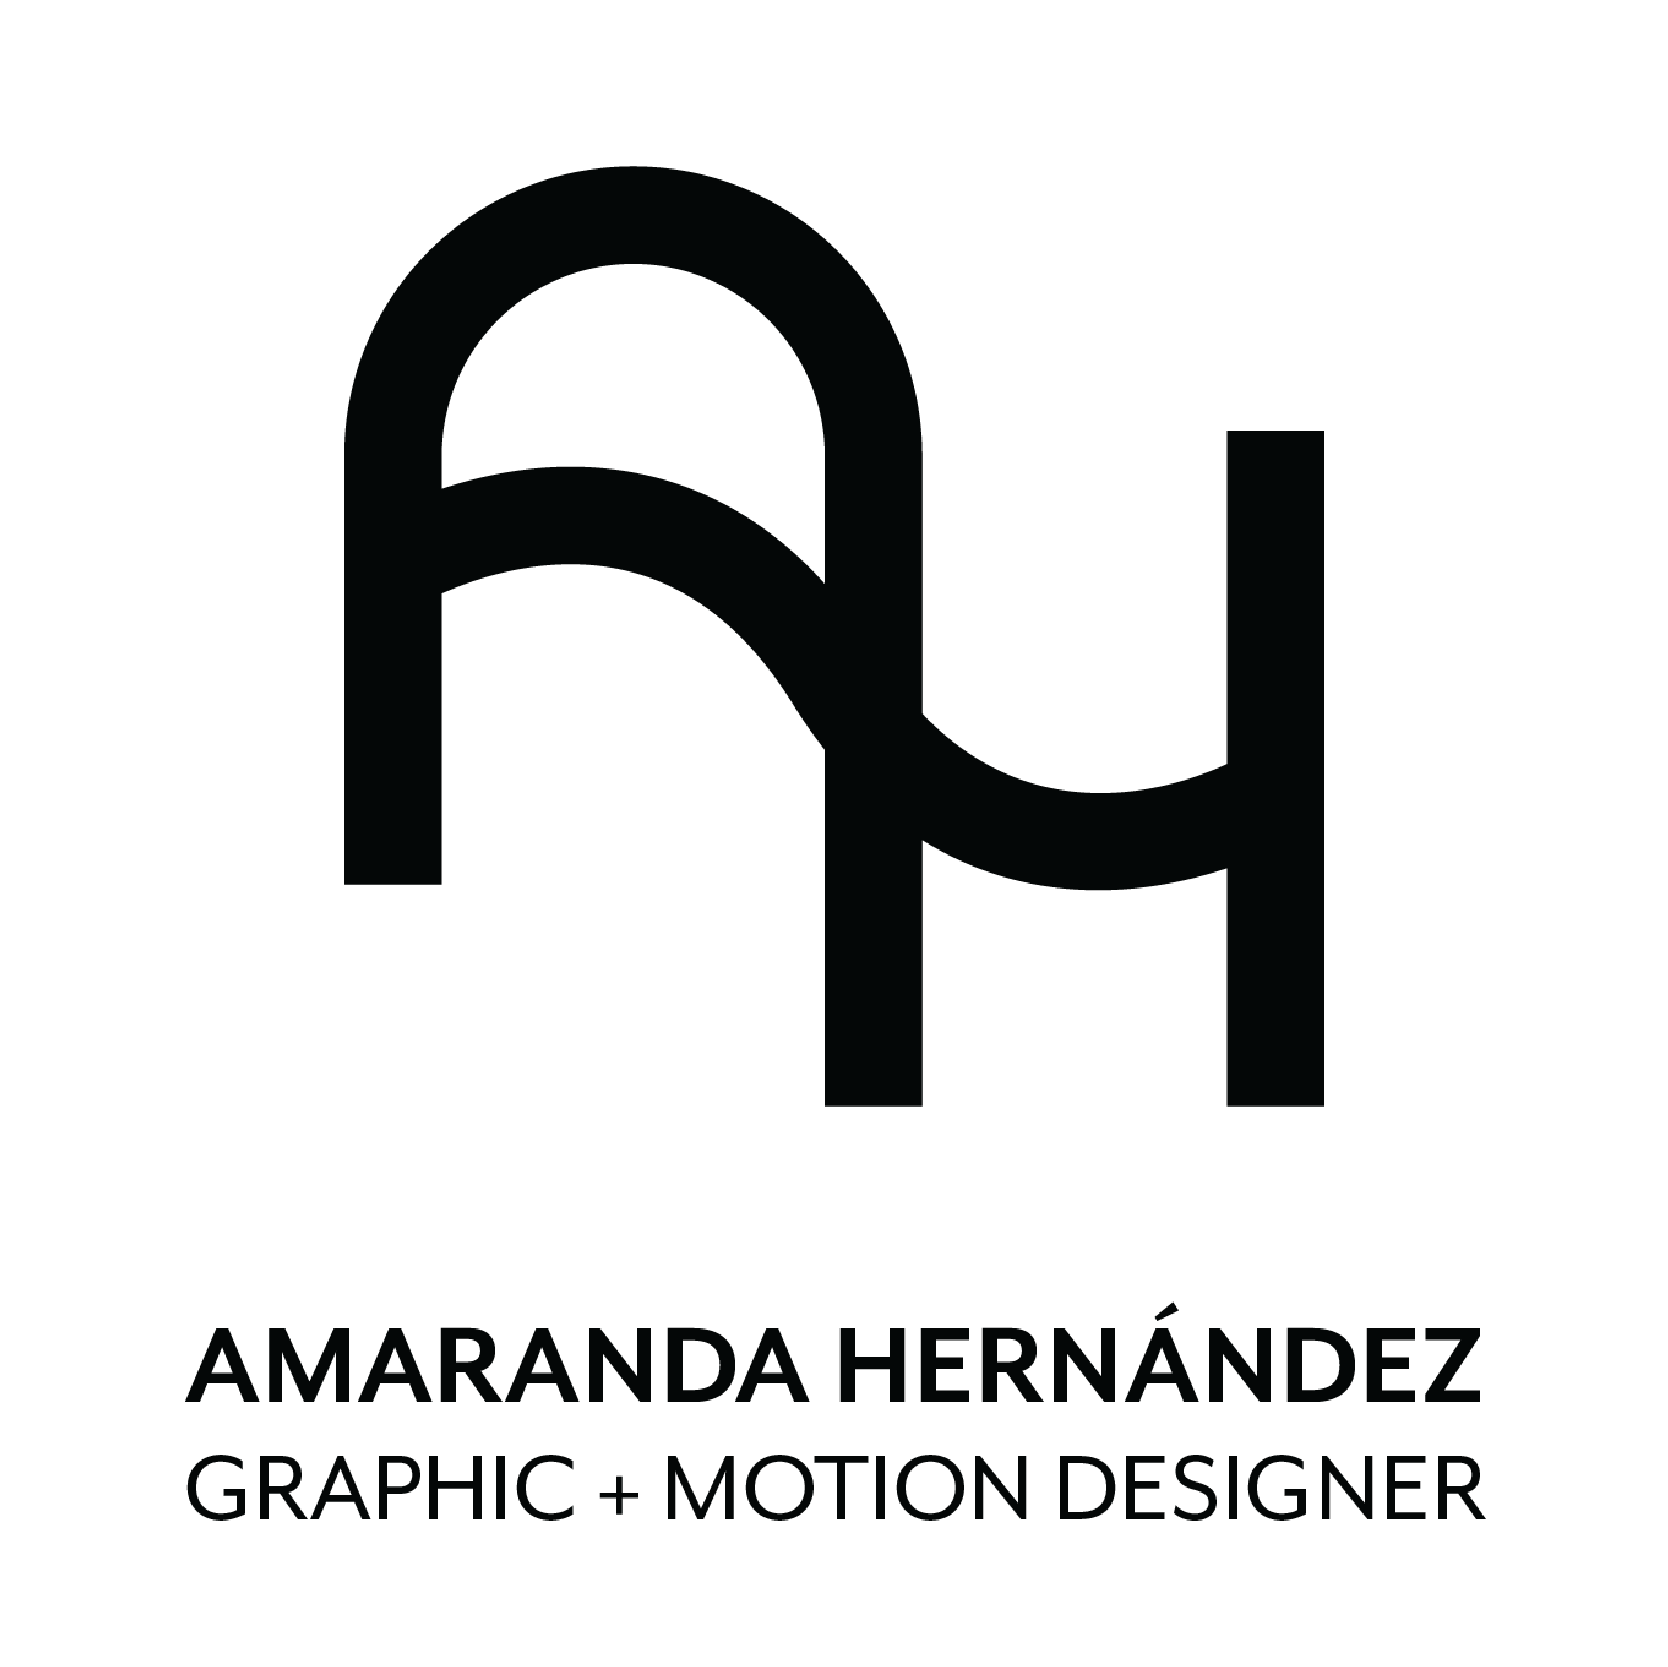 Amaranda Hernandez